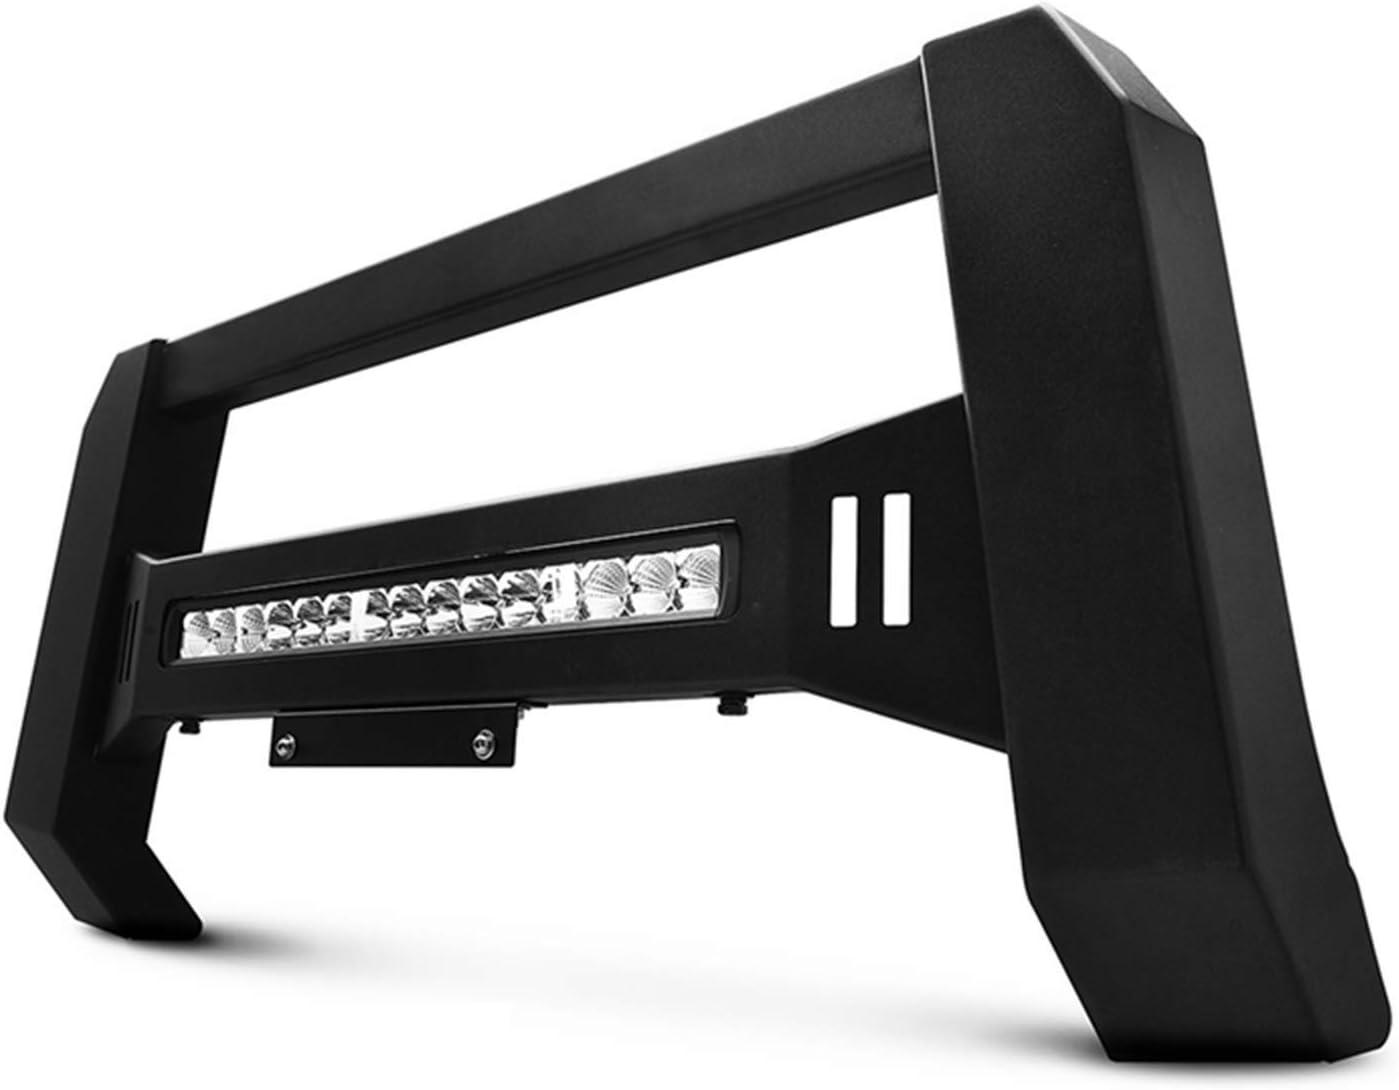 TAC Modular Bull Bar - bully bars for trucks